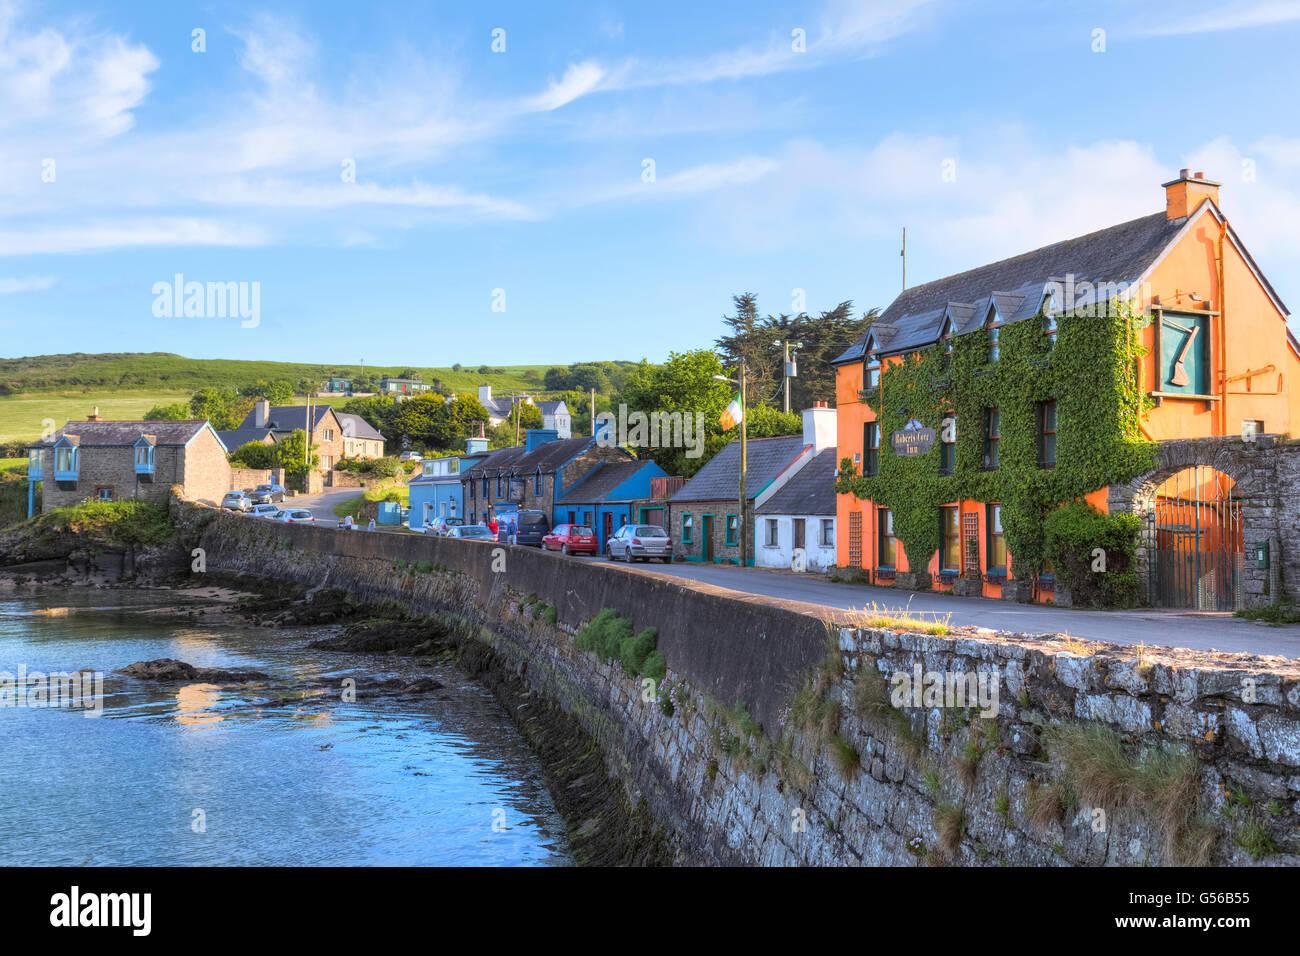 Roberts Cove, County Cork, Ireland - Stock Image